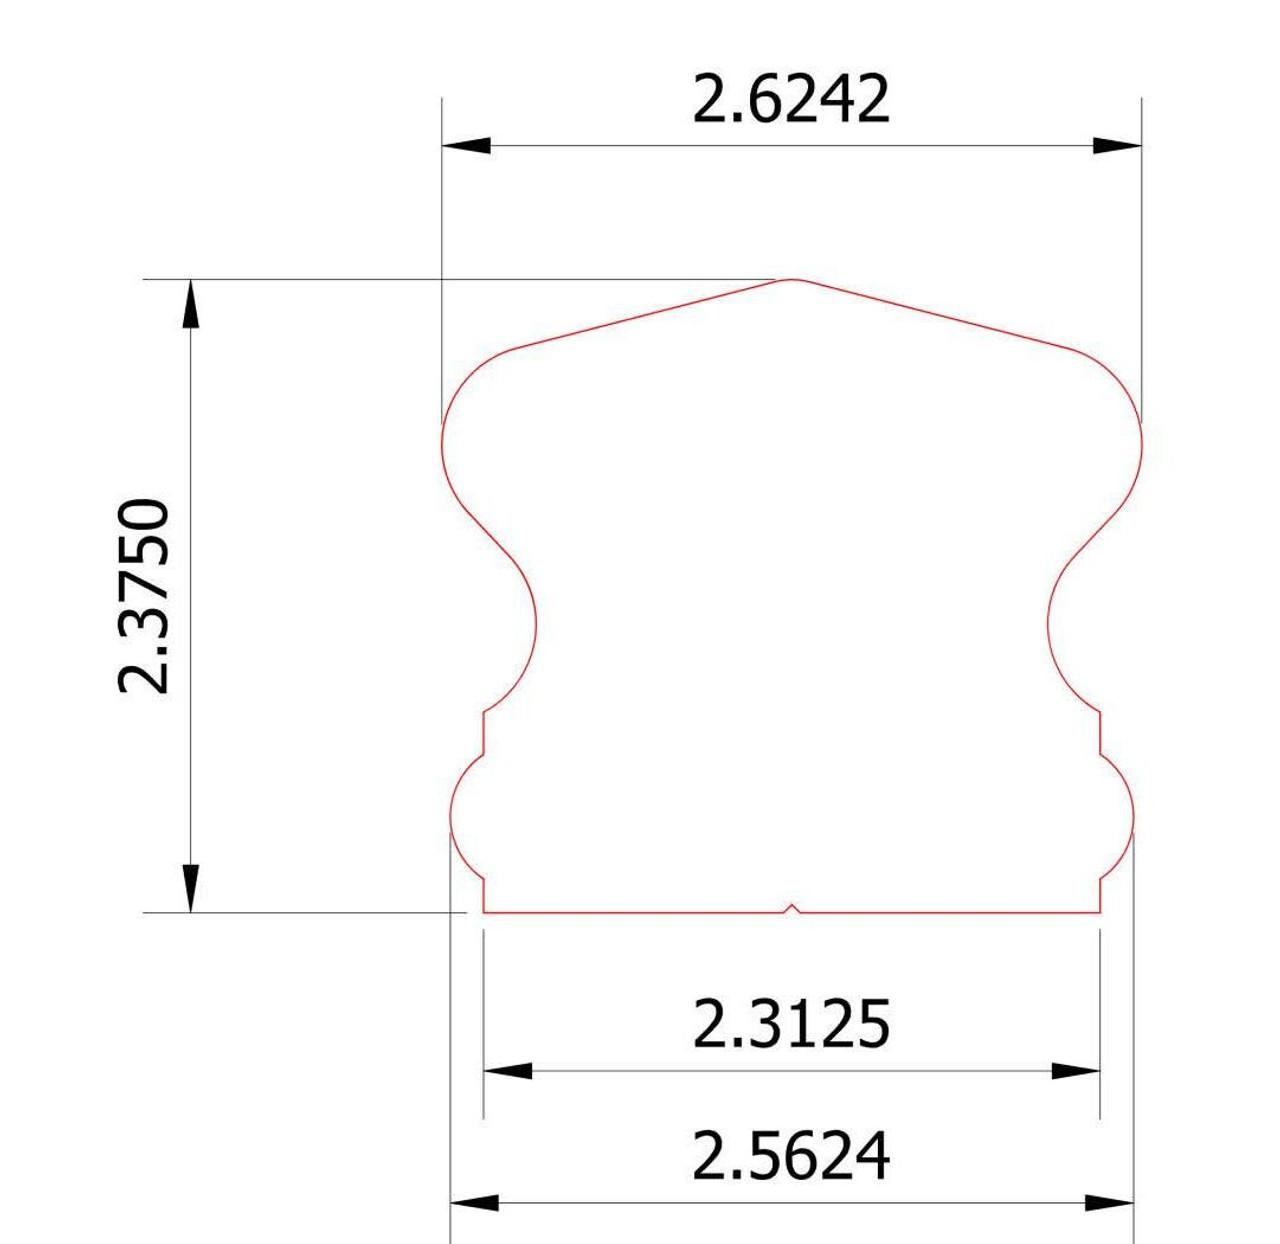 6910 CADD Drawing